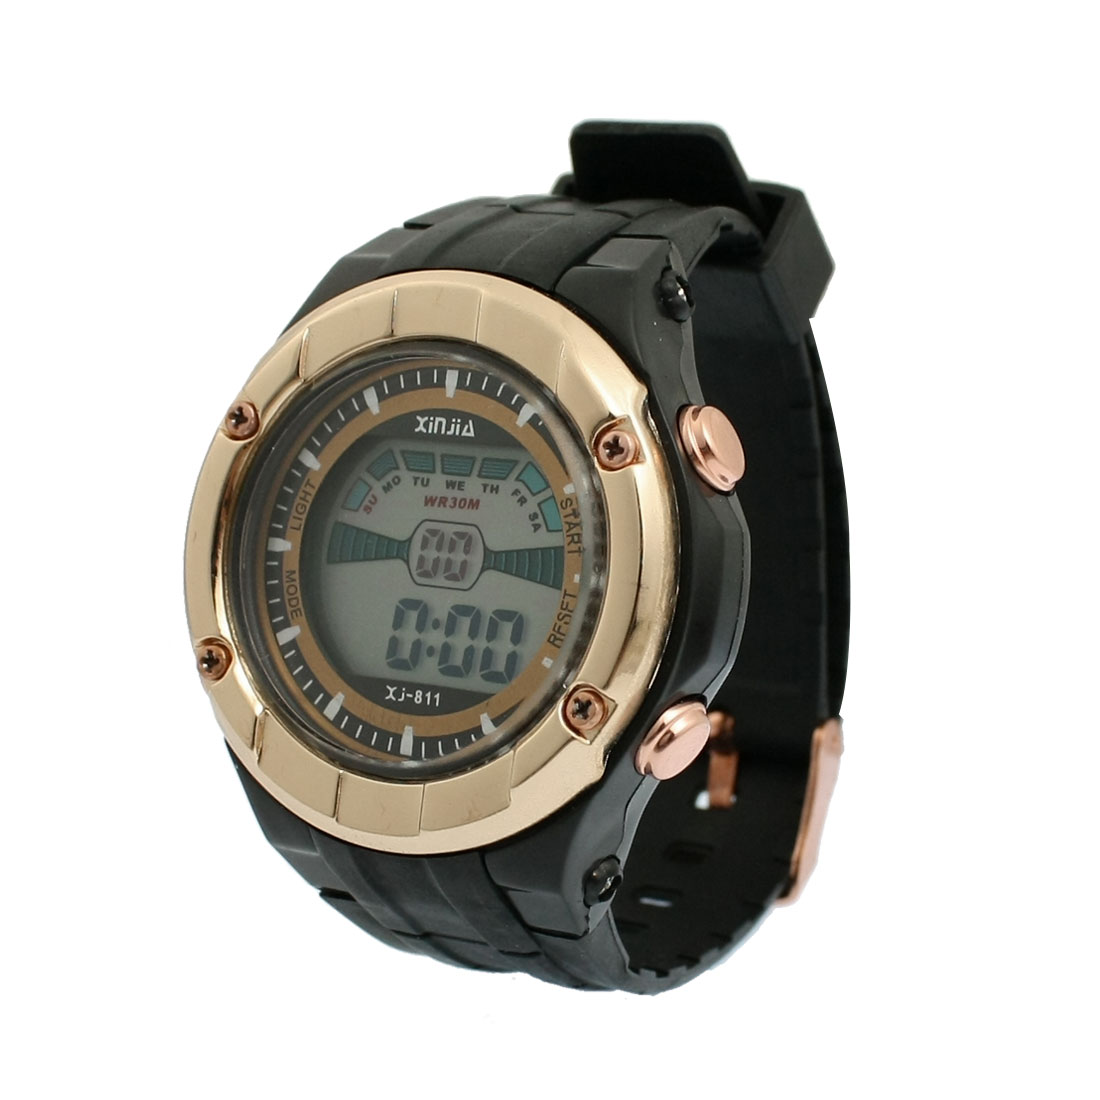 Adjustable Band Coldlight Stopwatch Alarm Clock Watch Black Gold Tone